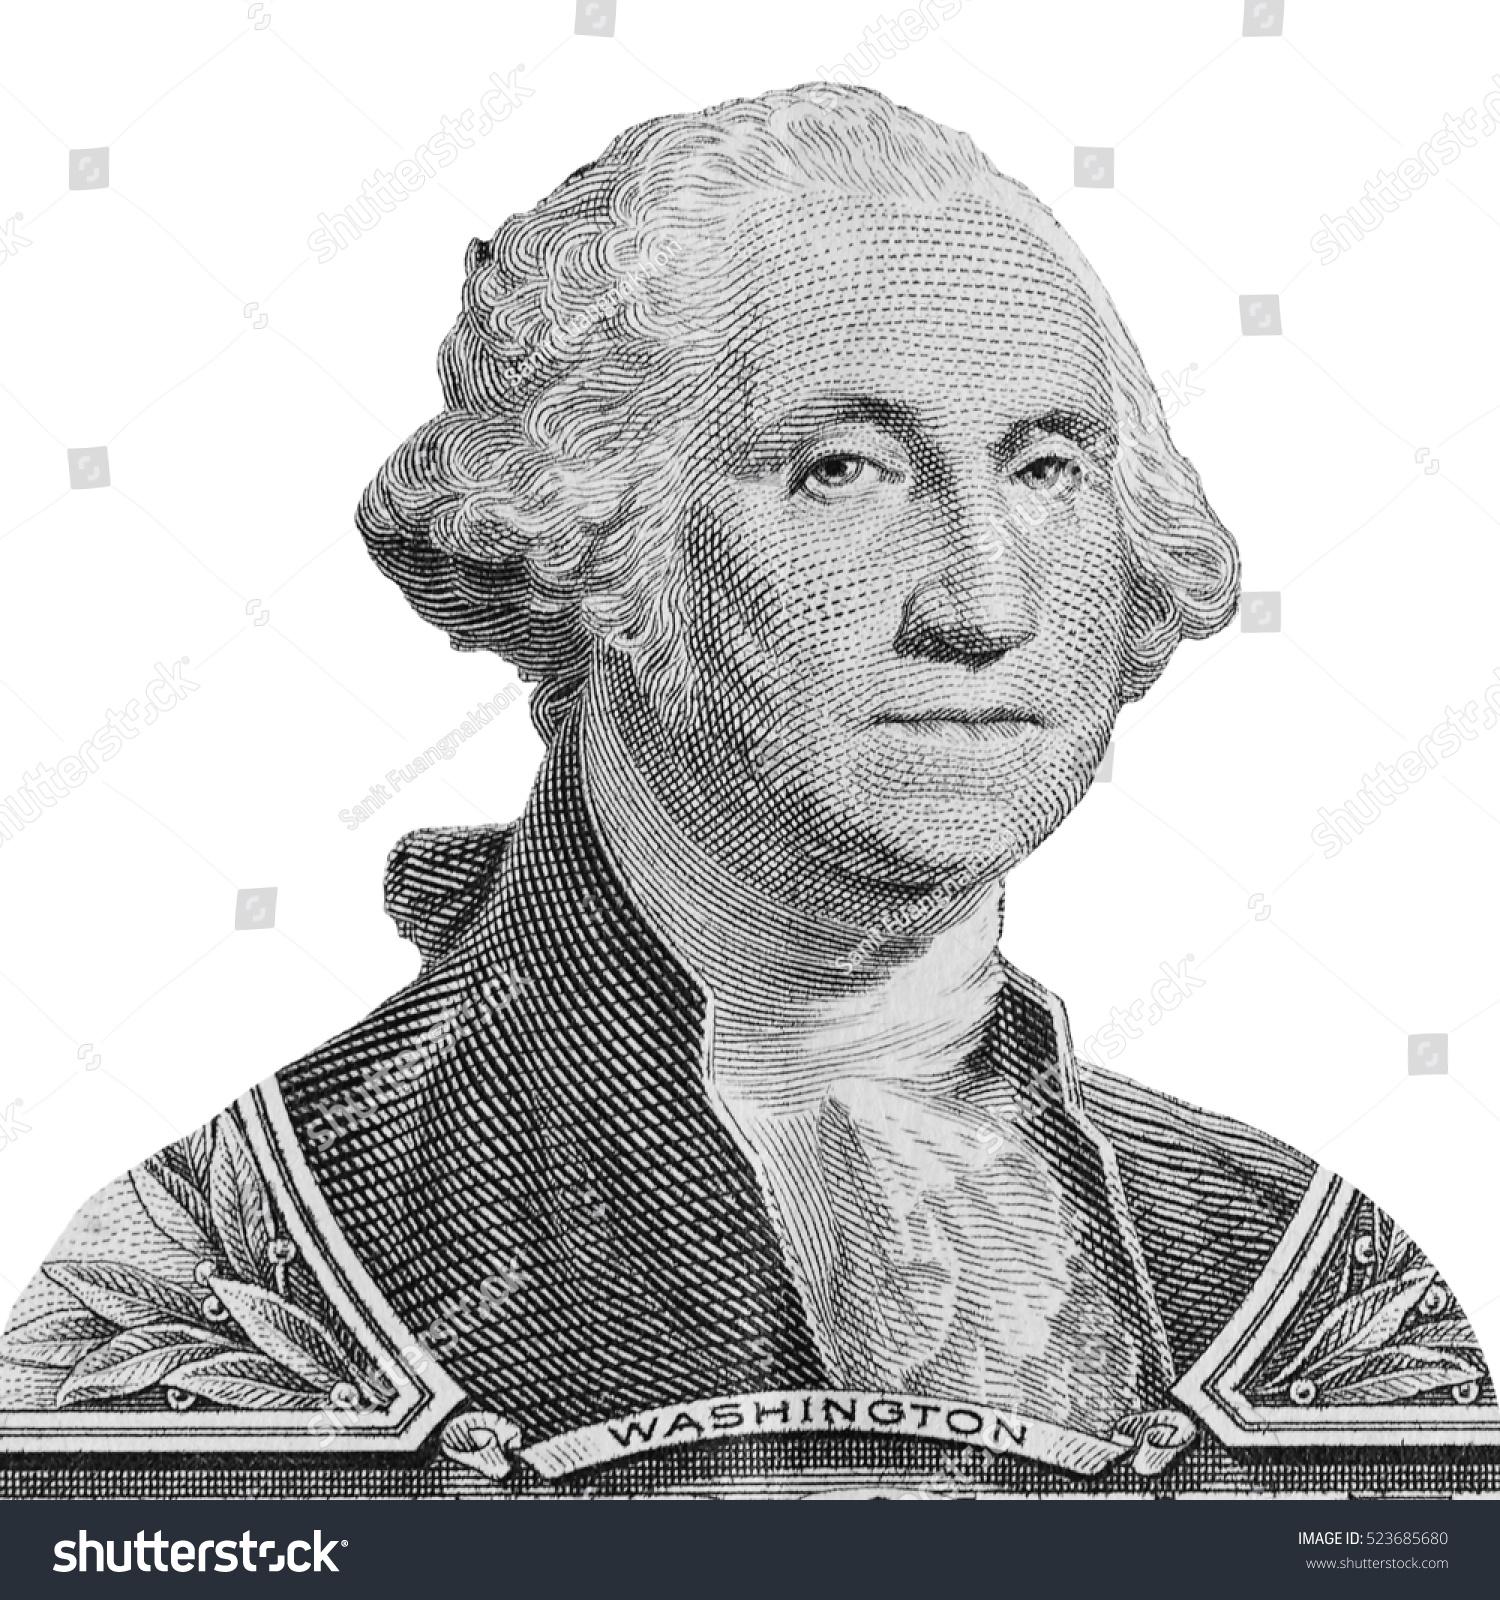 Us President George Washington Portrait On The One Dollar